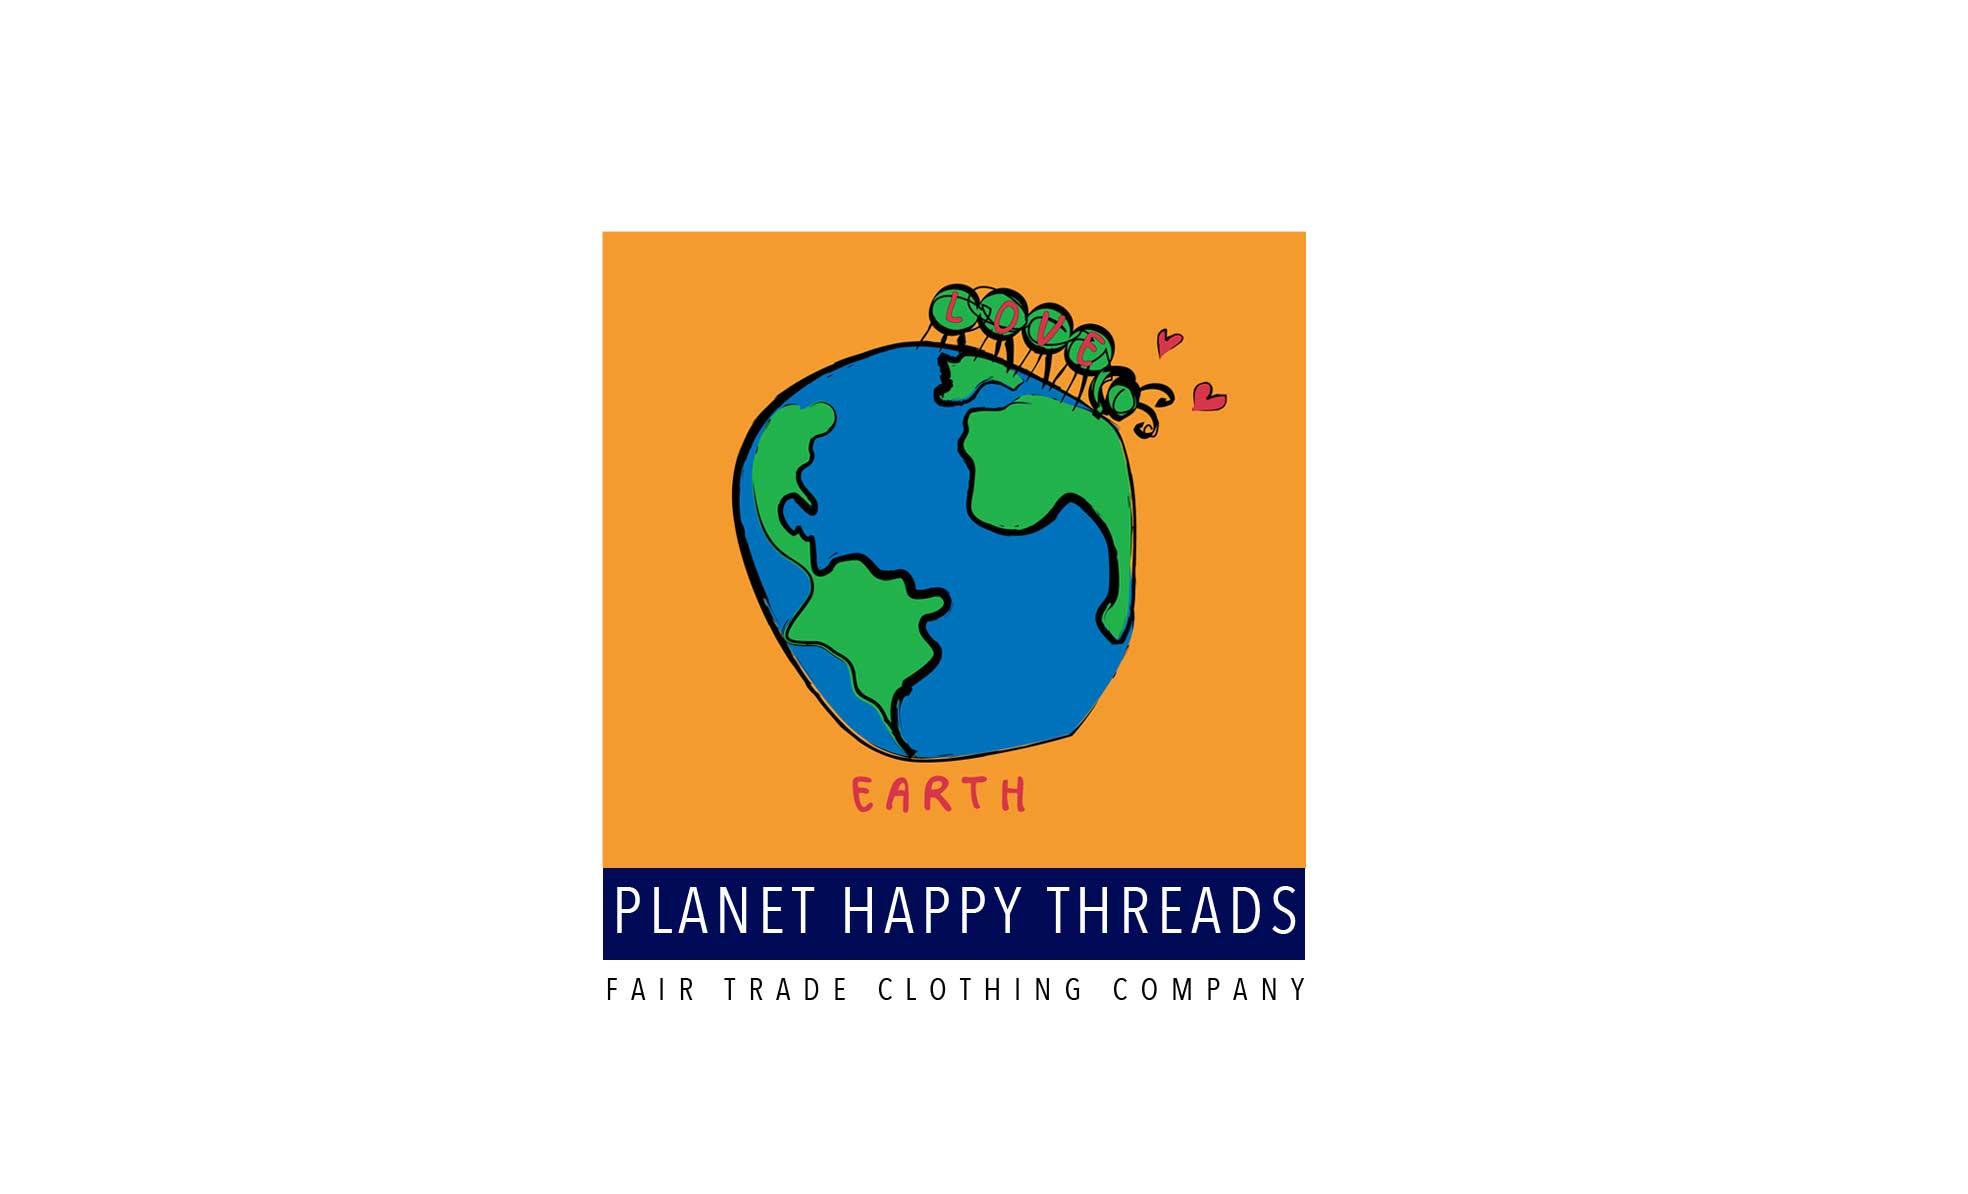 planet-happy-threads-logo-design3